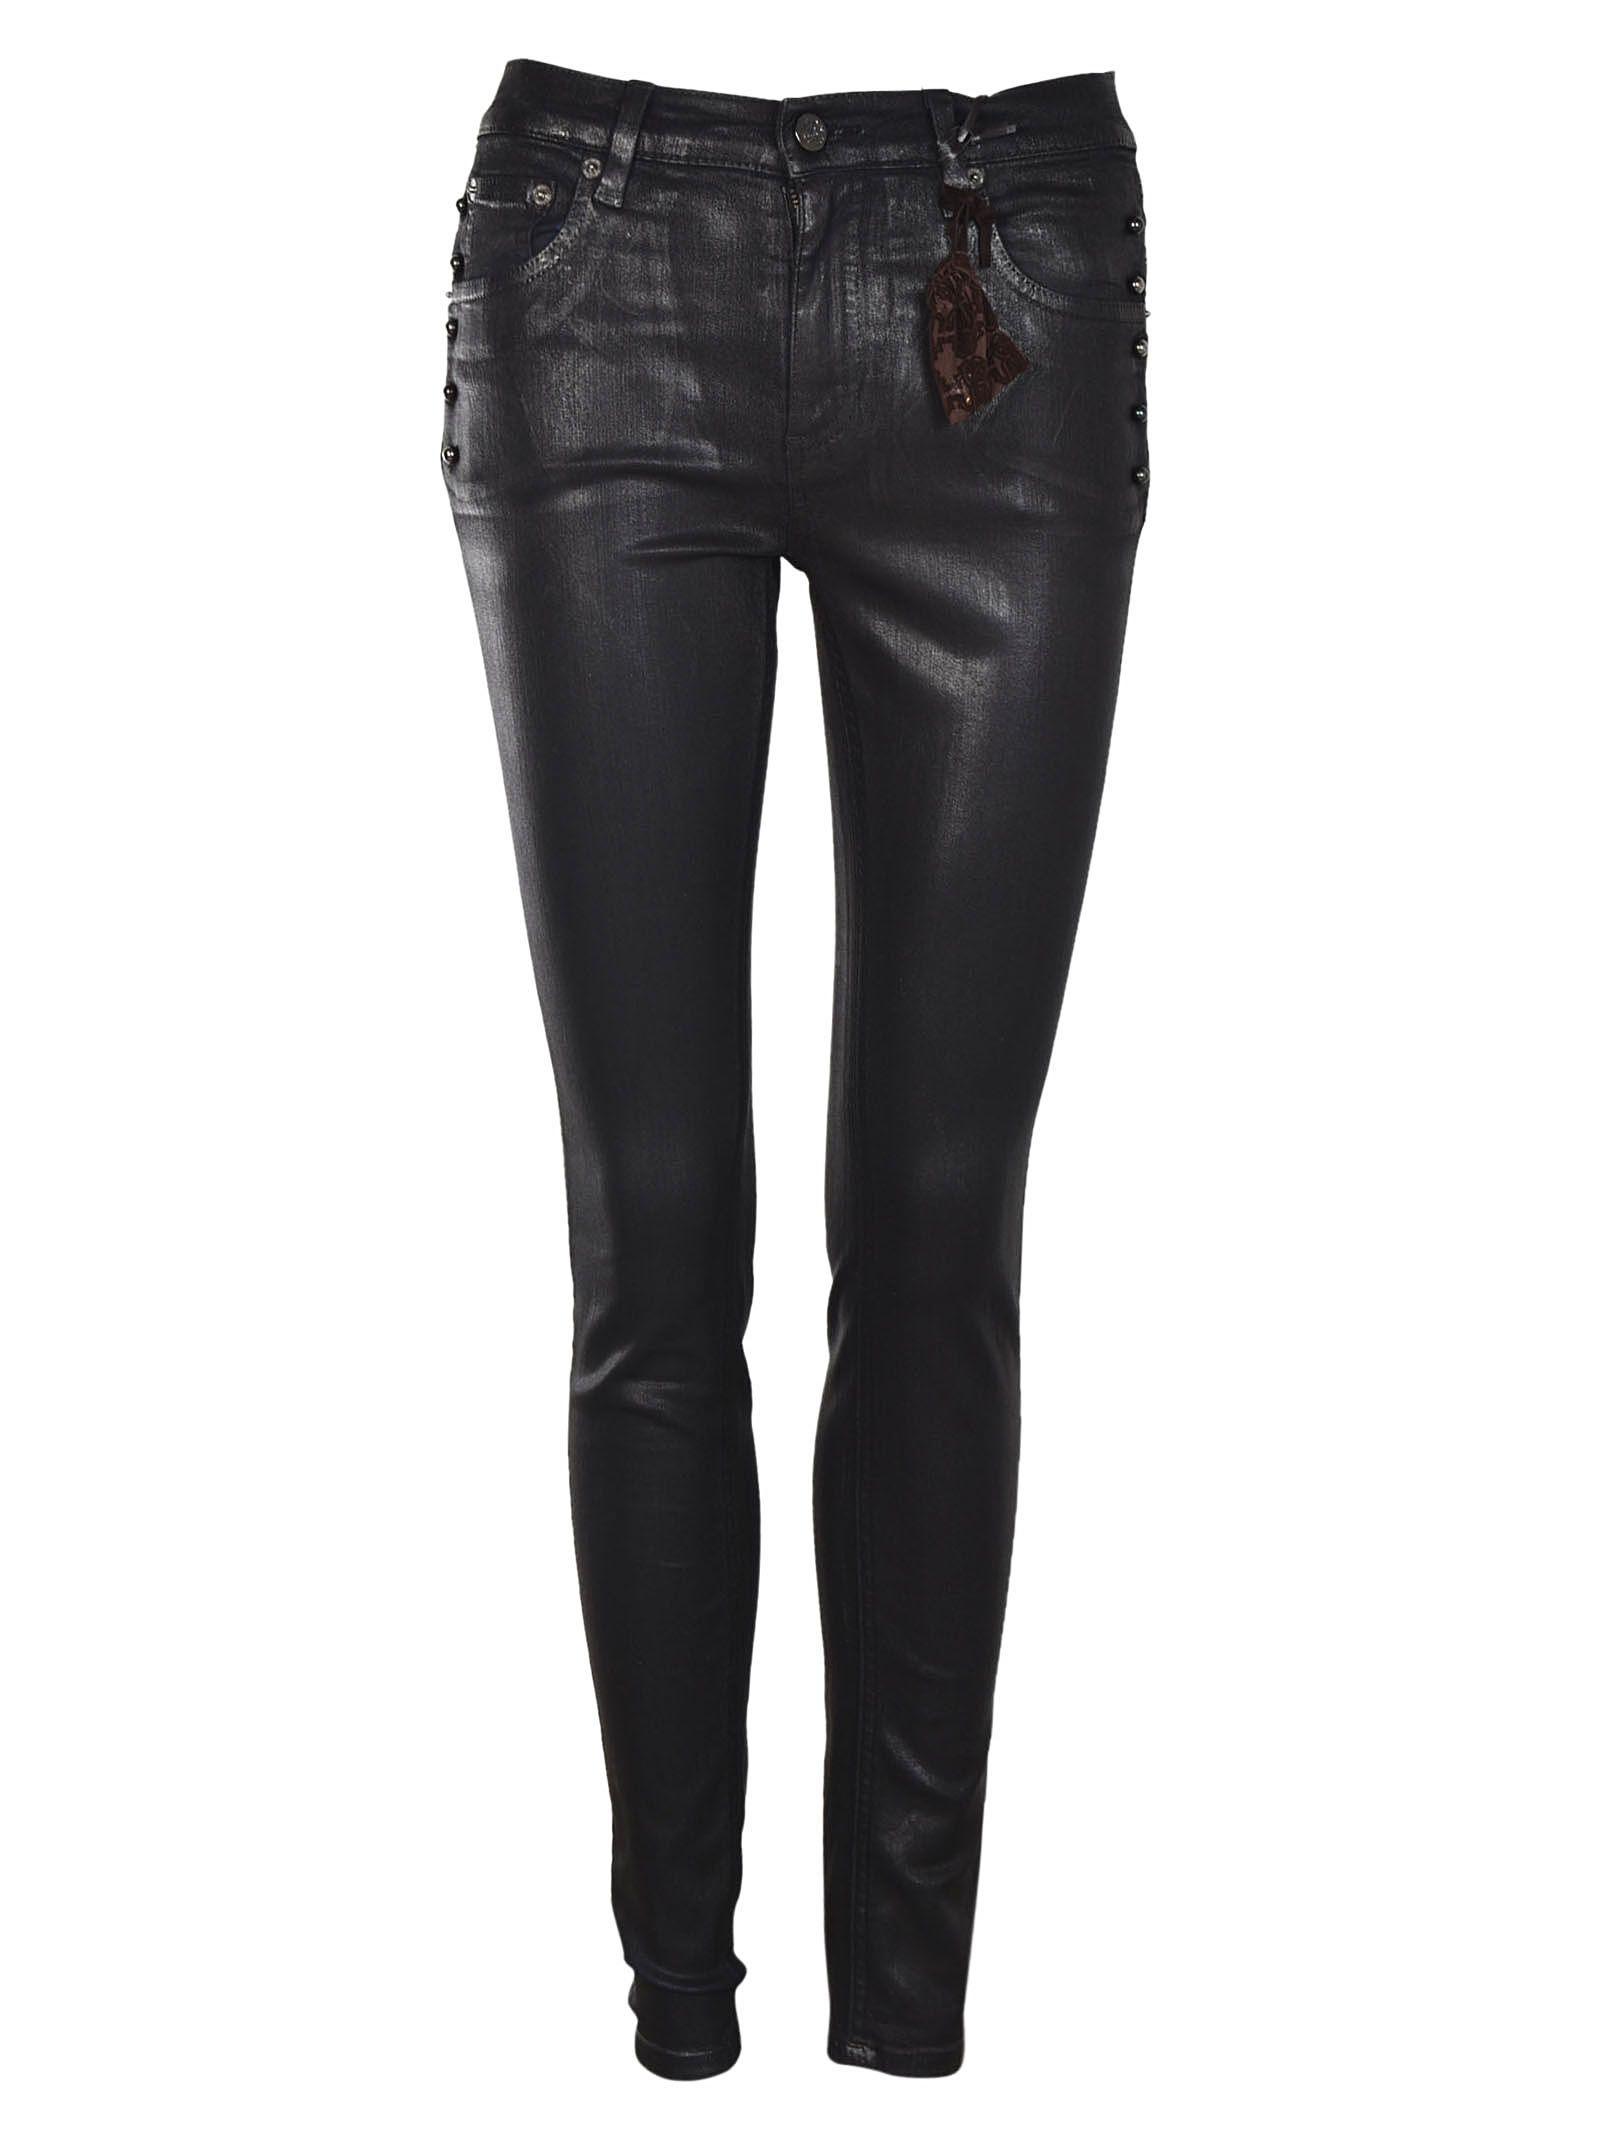 Roberto Cavalli Skinny Piercing Jeans